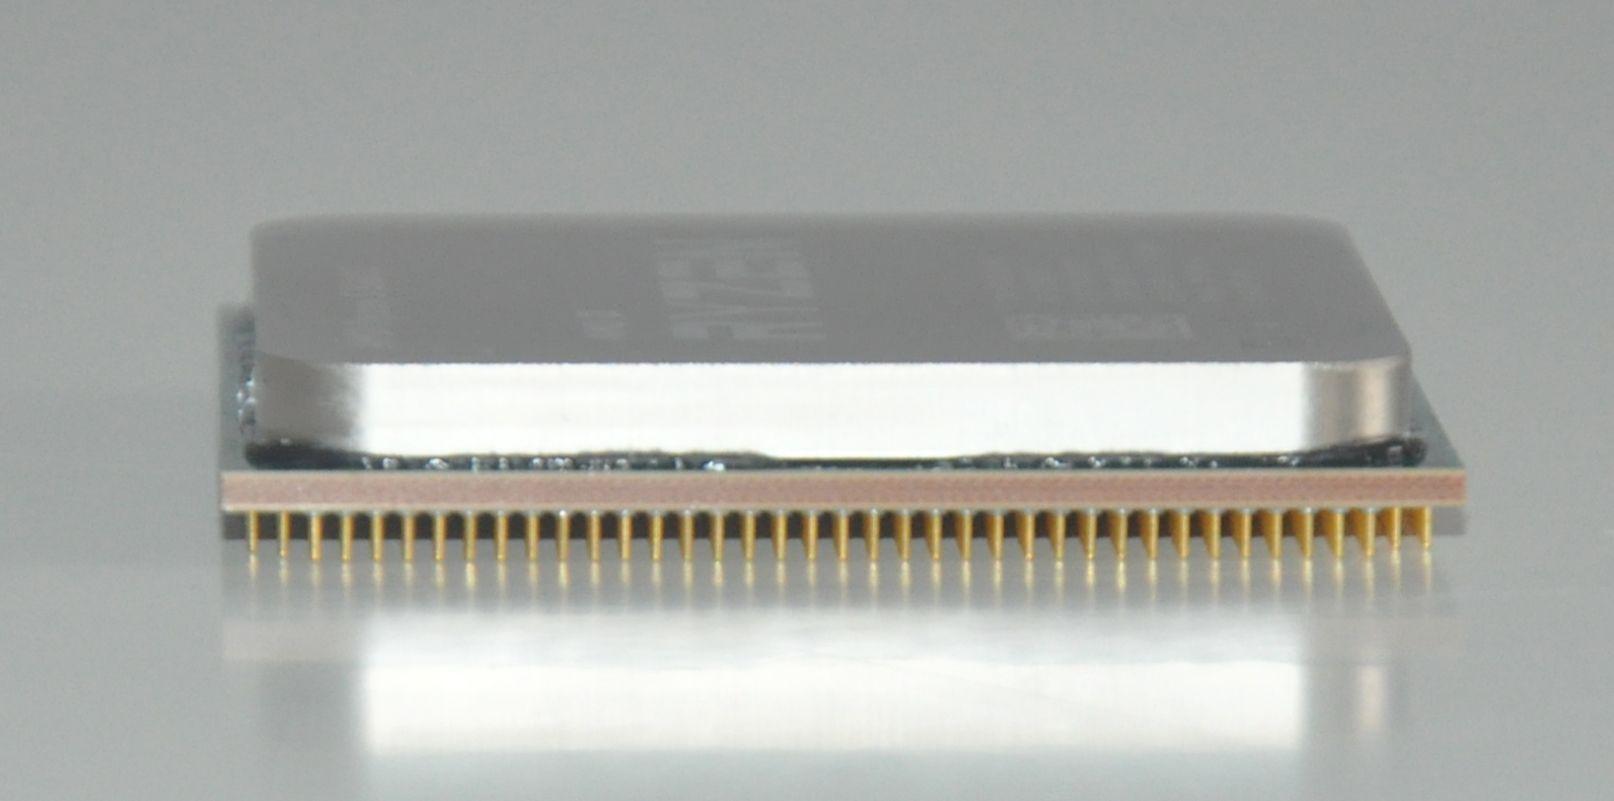 Review Ryzen 5 5600X 12